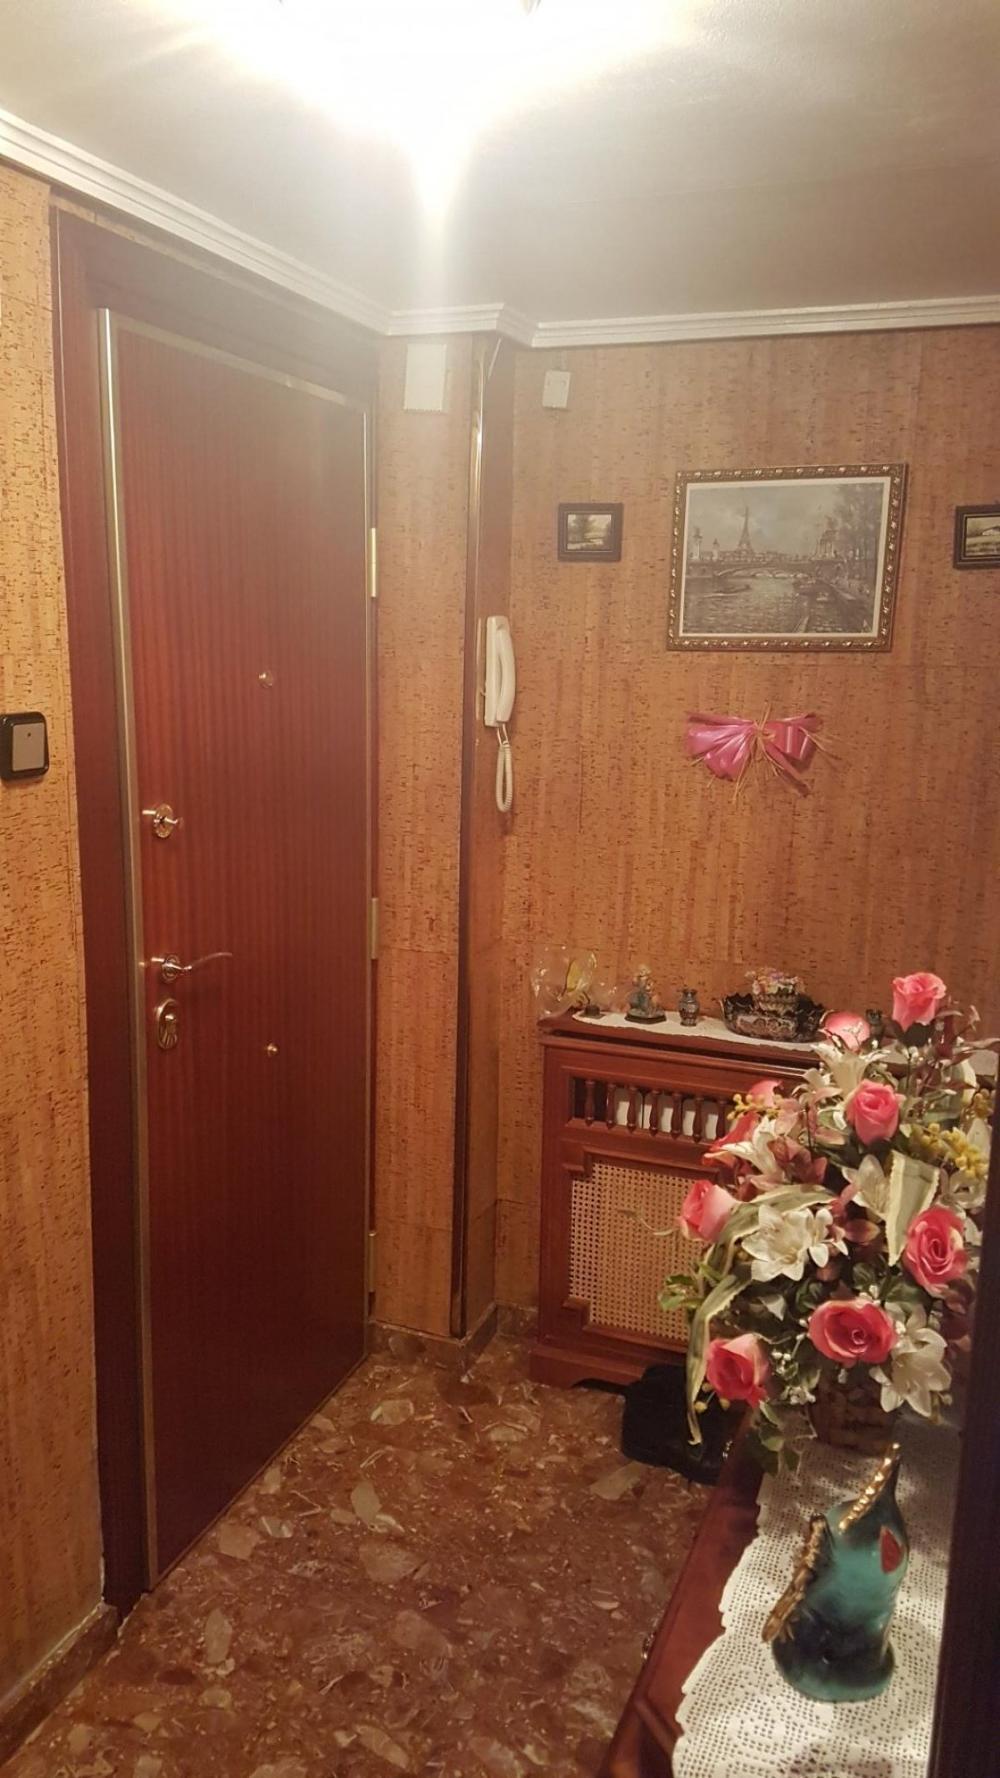 delicias 50017 zaragoza appartement foto 3059861